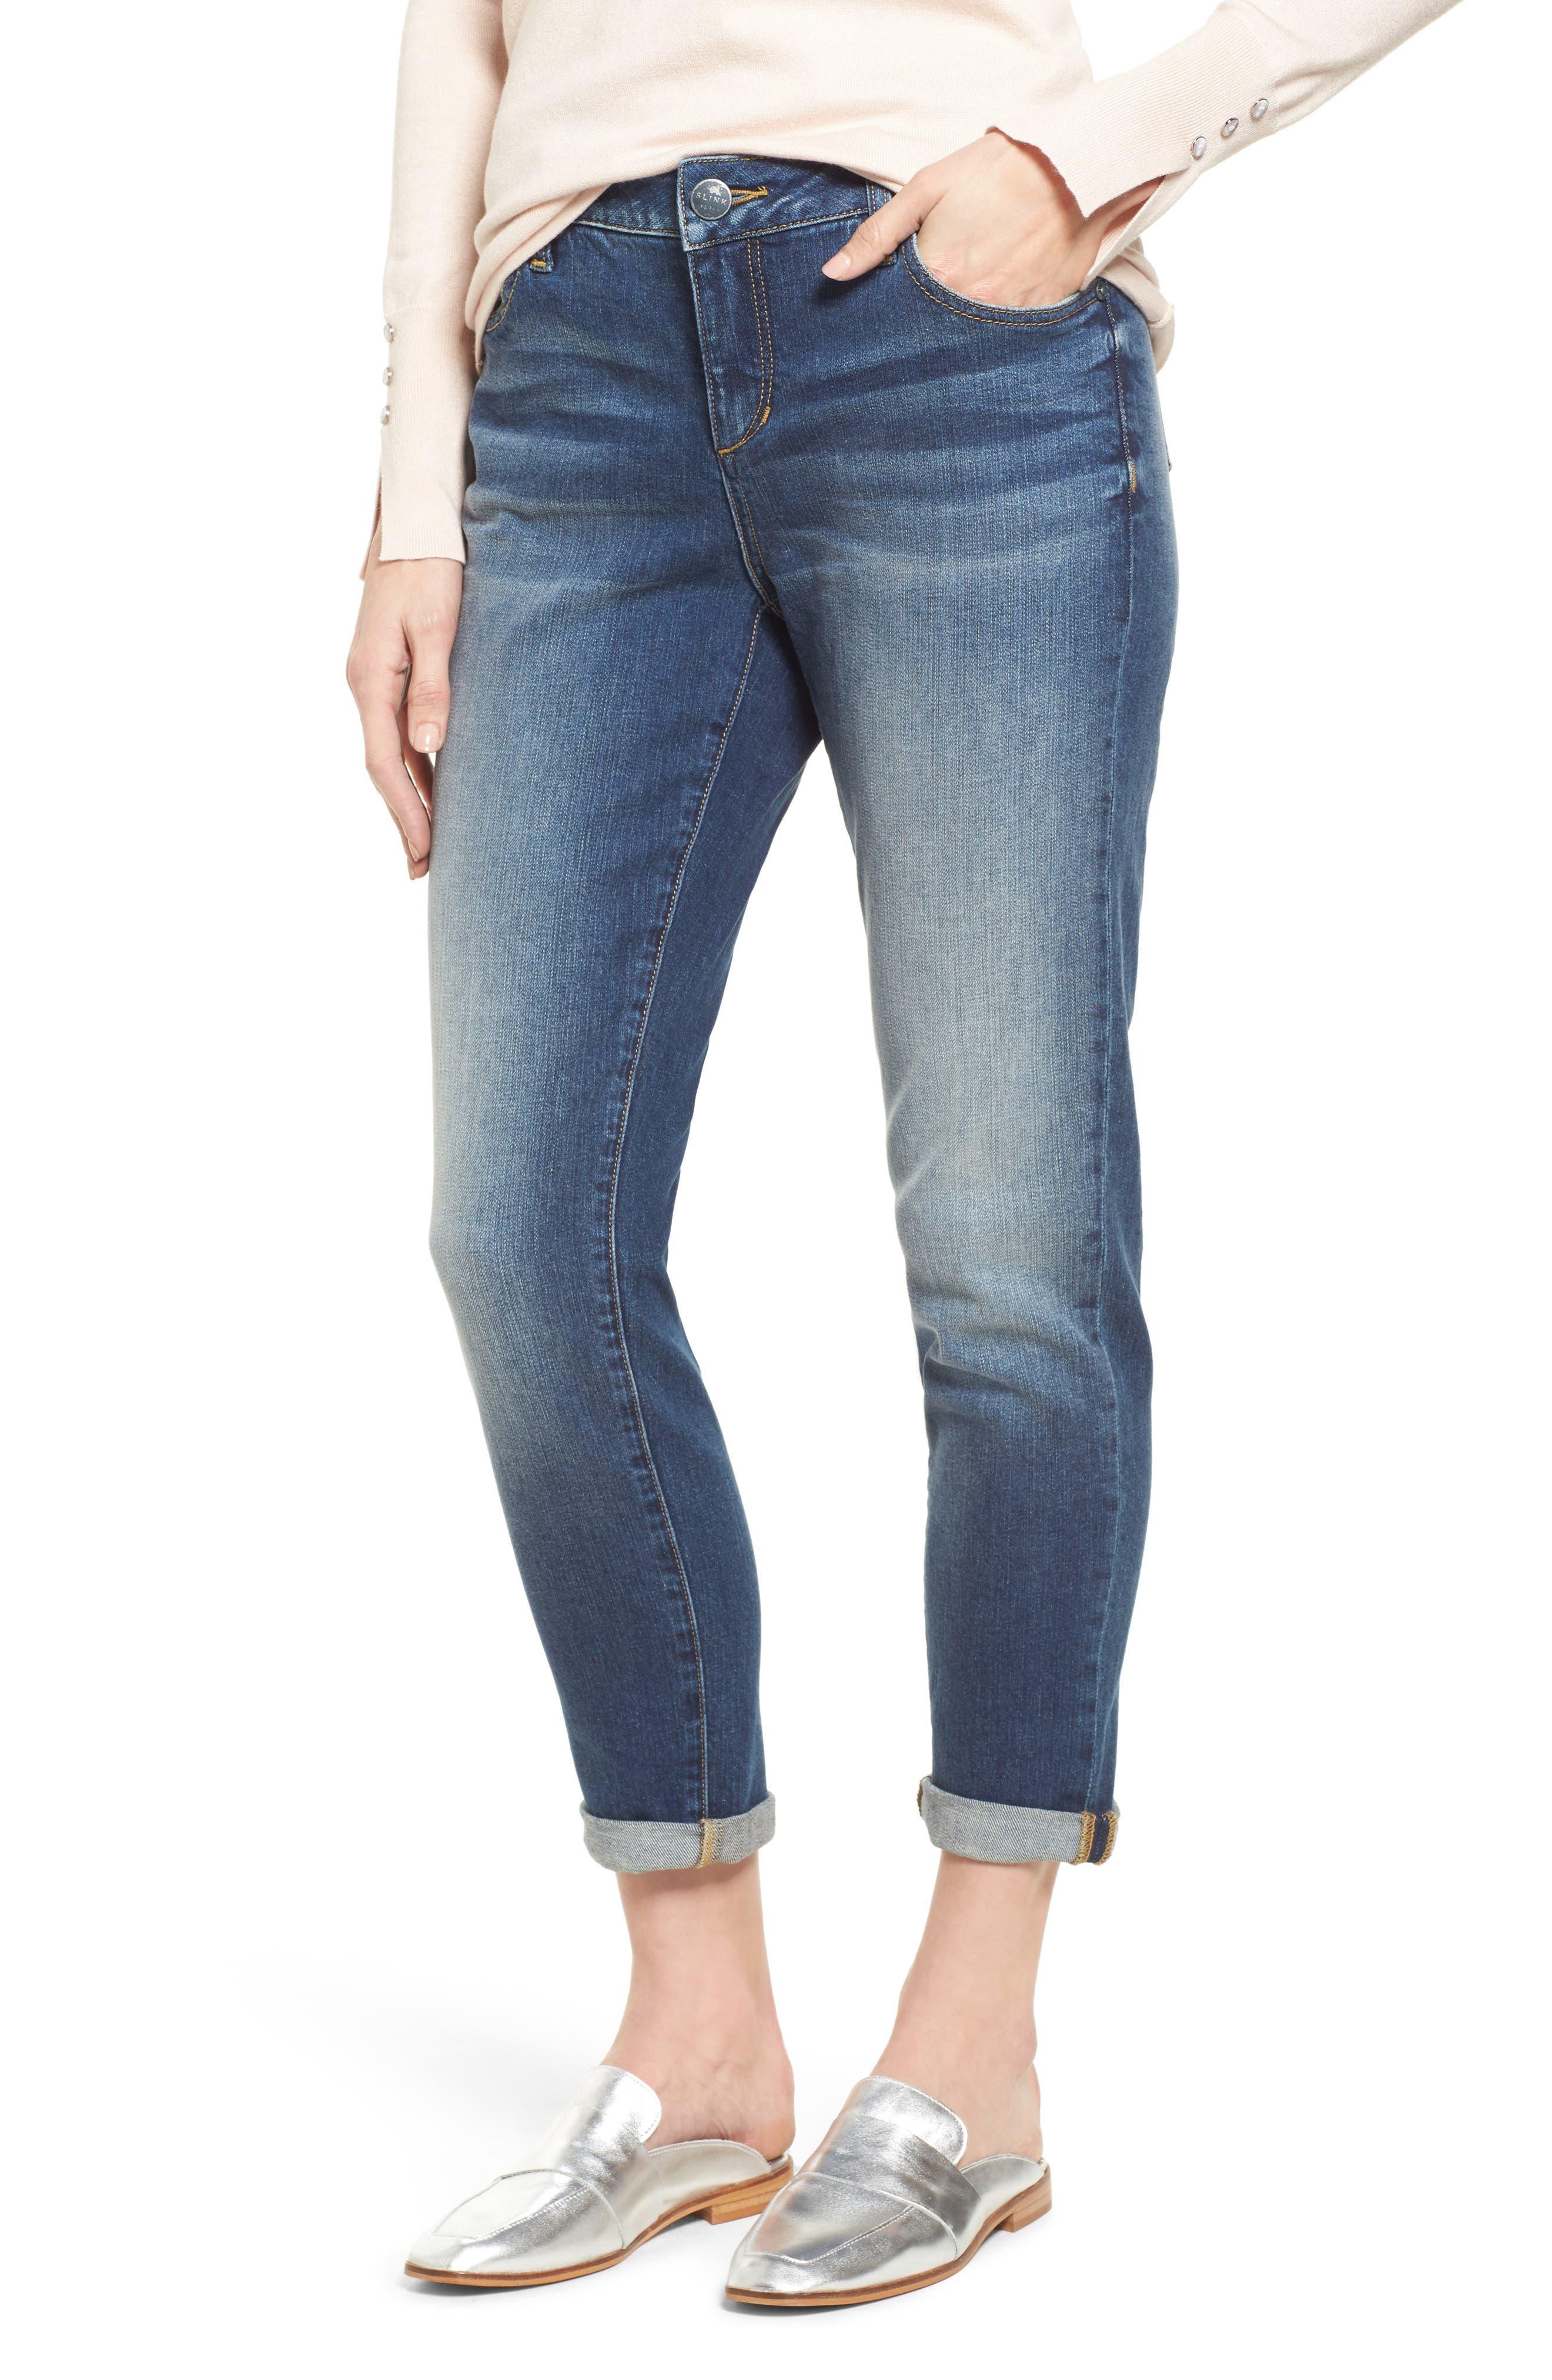 SLINK Jeans Rolled Boyfriend Jeans (Val)